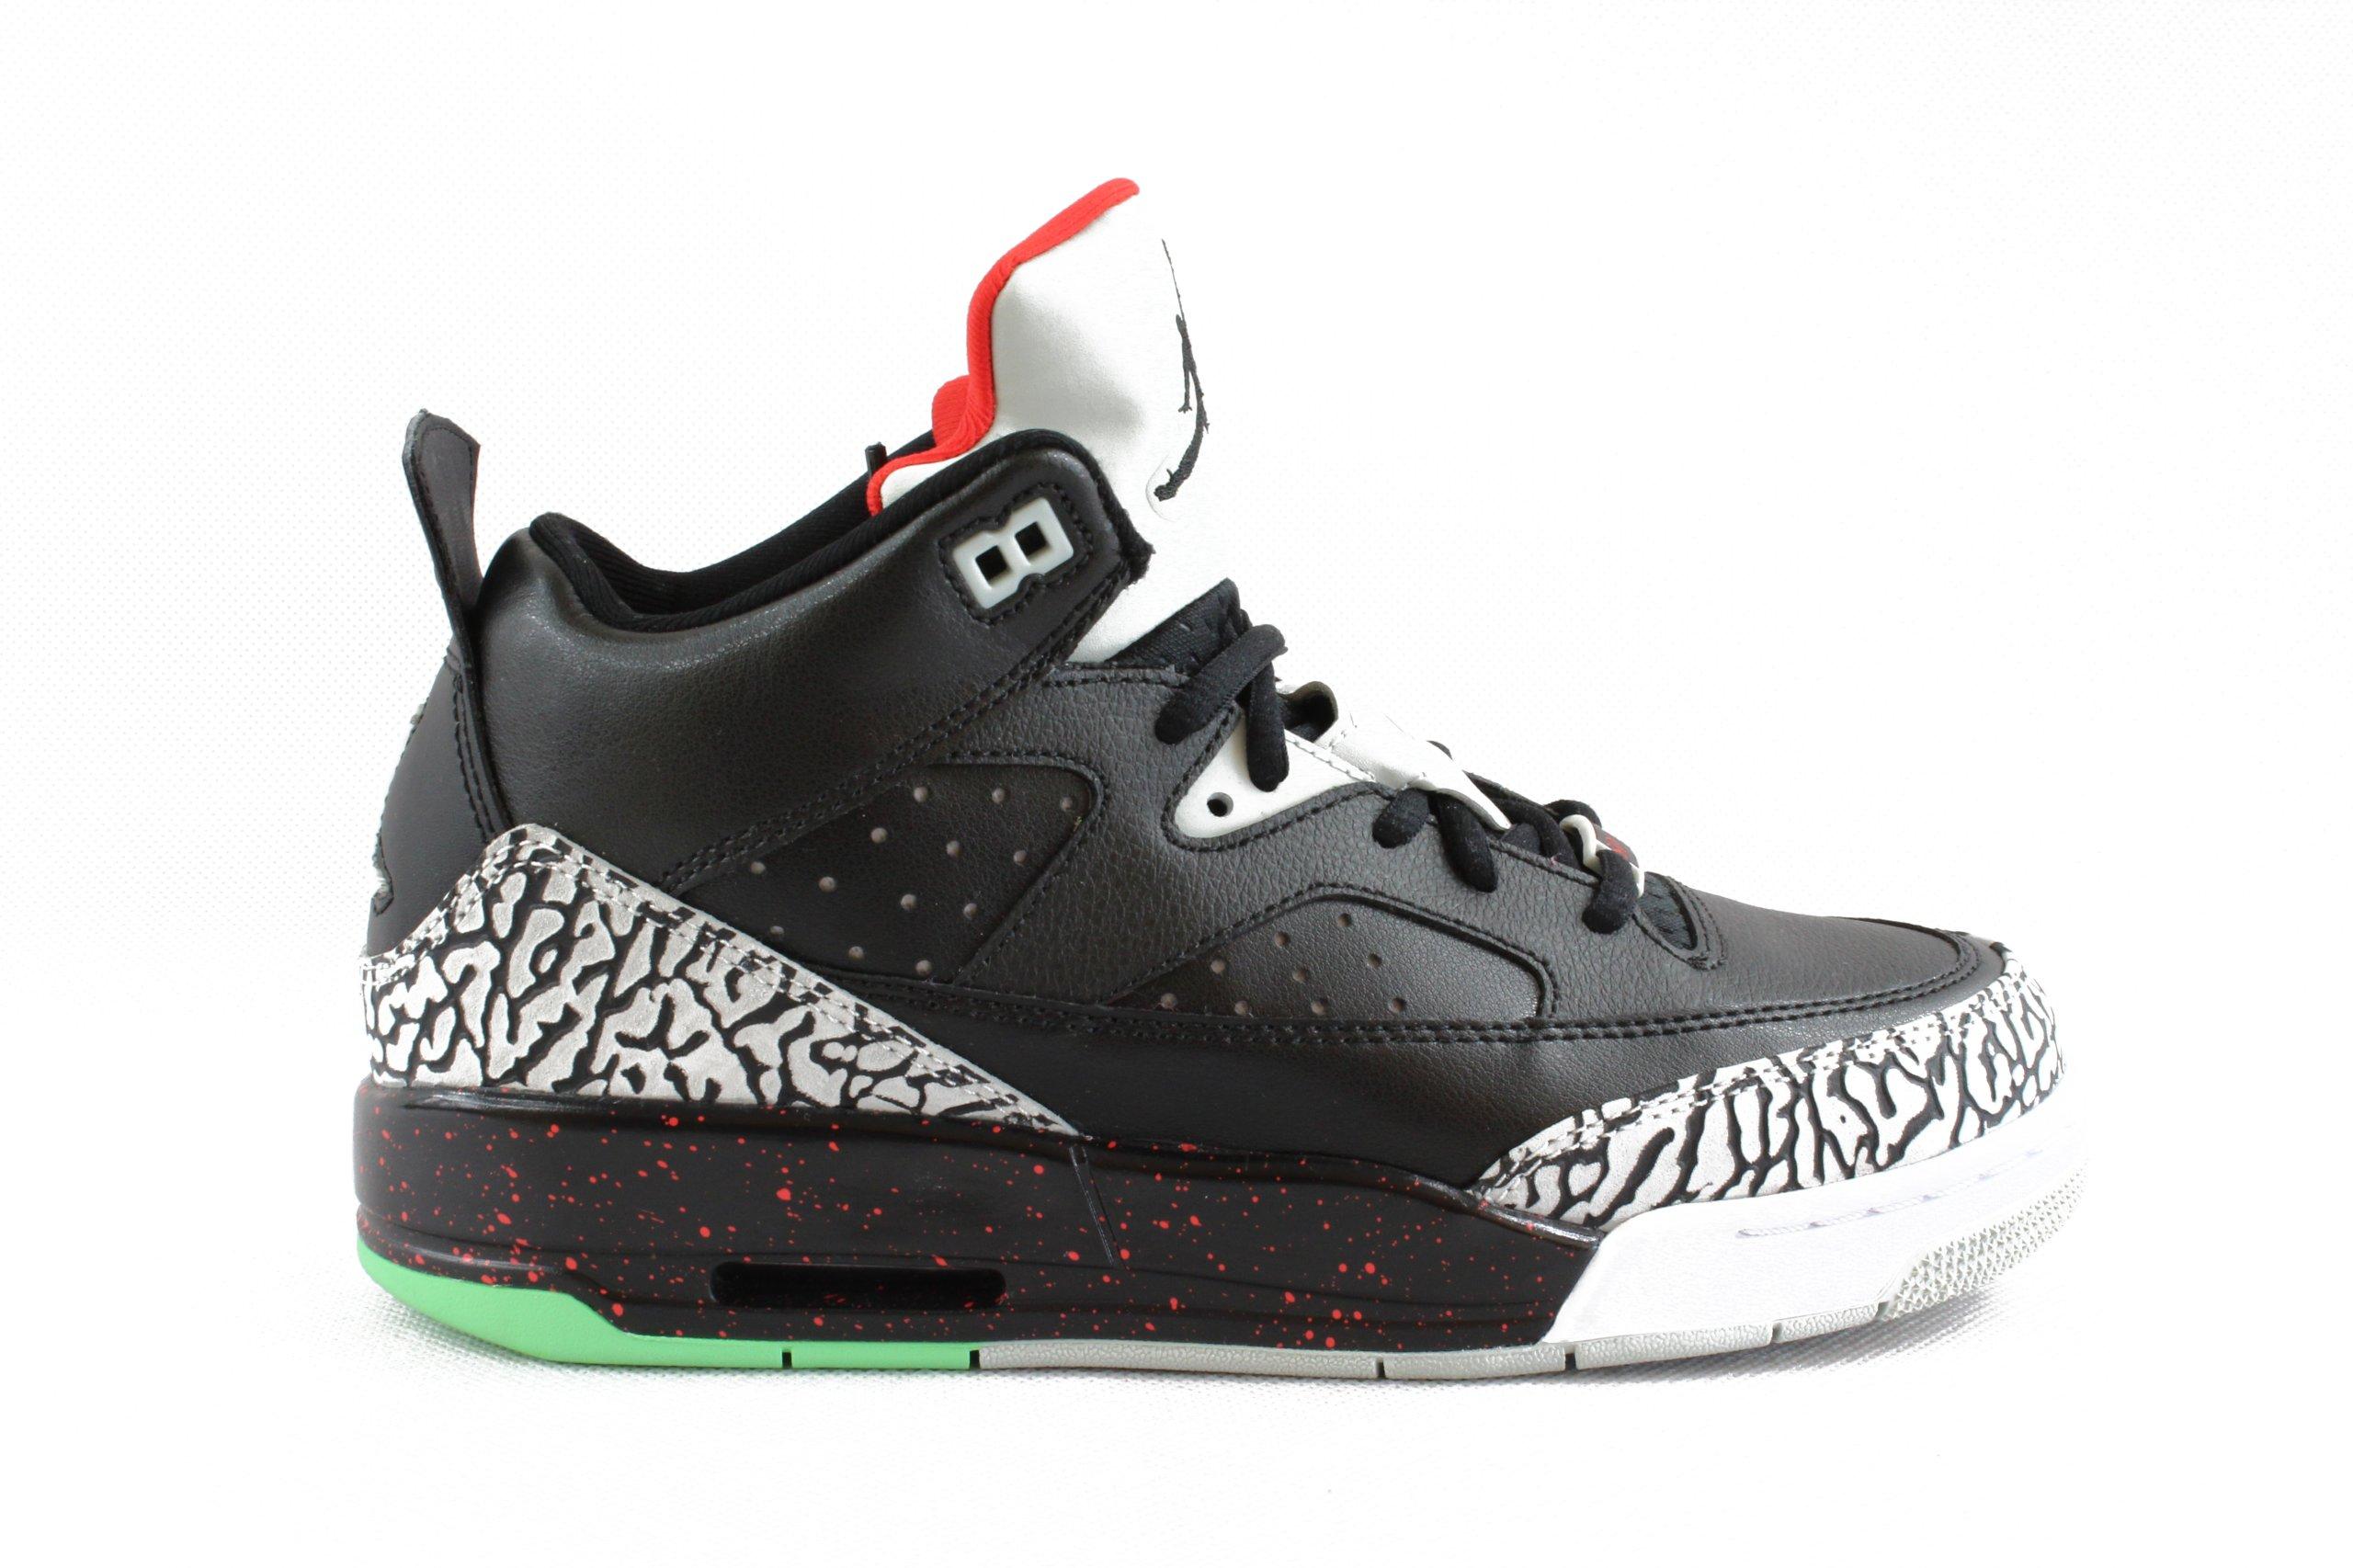 2494a1c512dc1f Buty Nike Jordan Son Of Low rozmiar 38